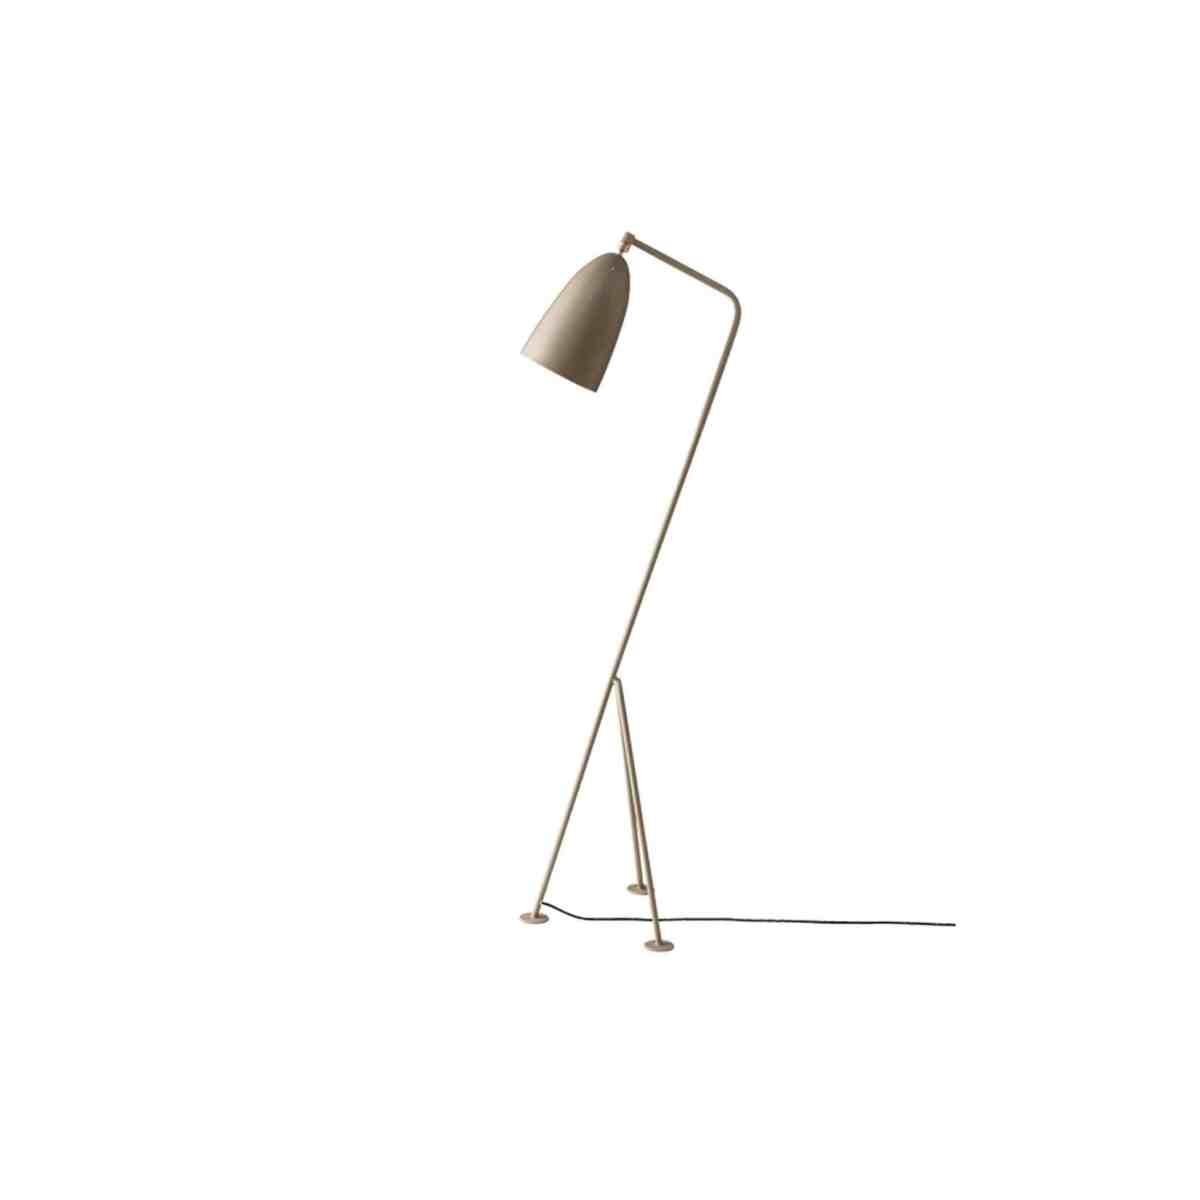 gubi-grashoppa-floor-lamp-warm-grey-001